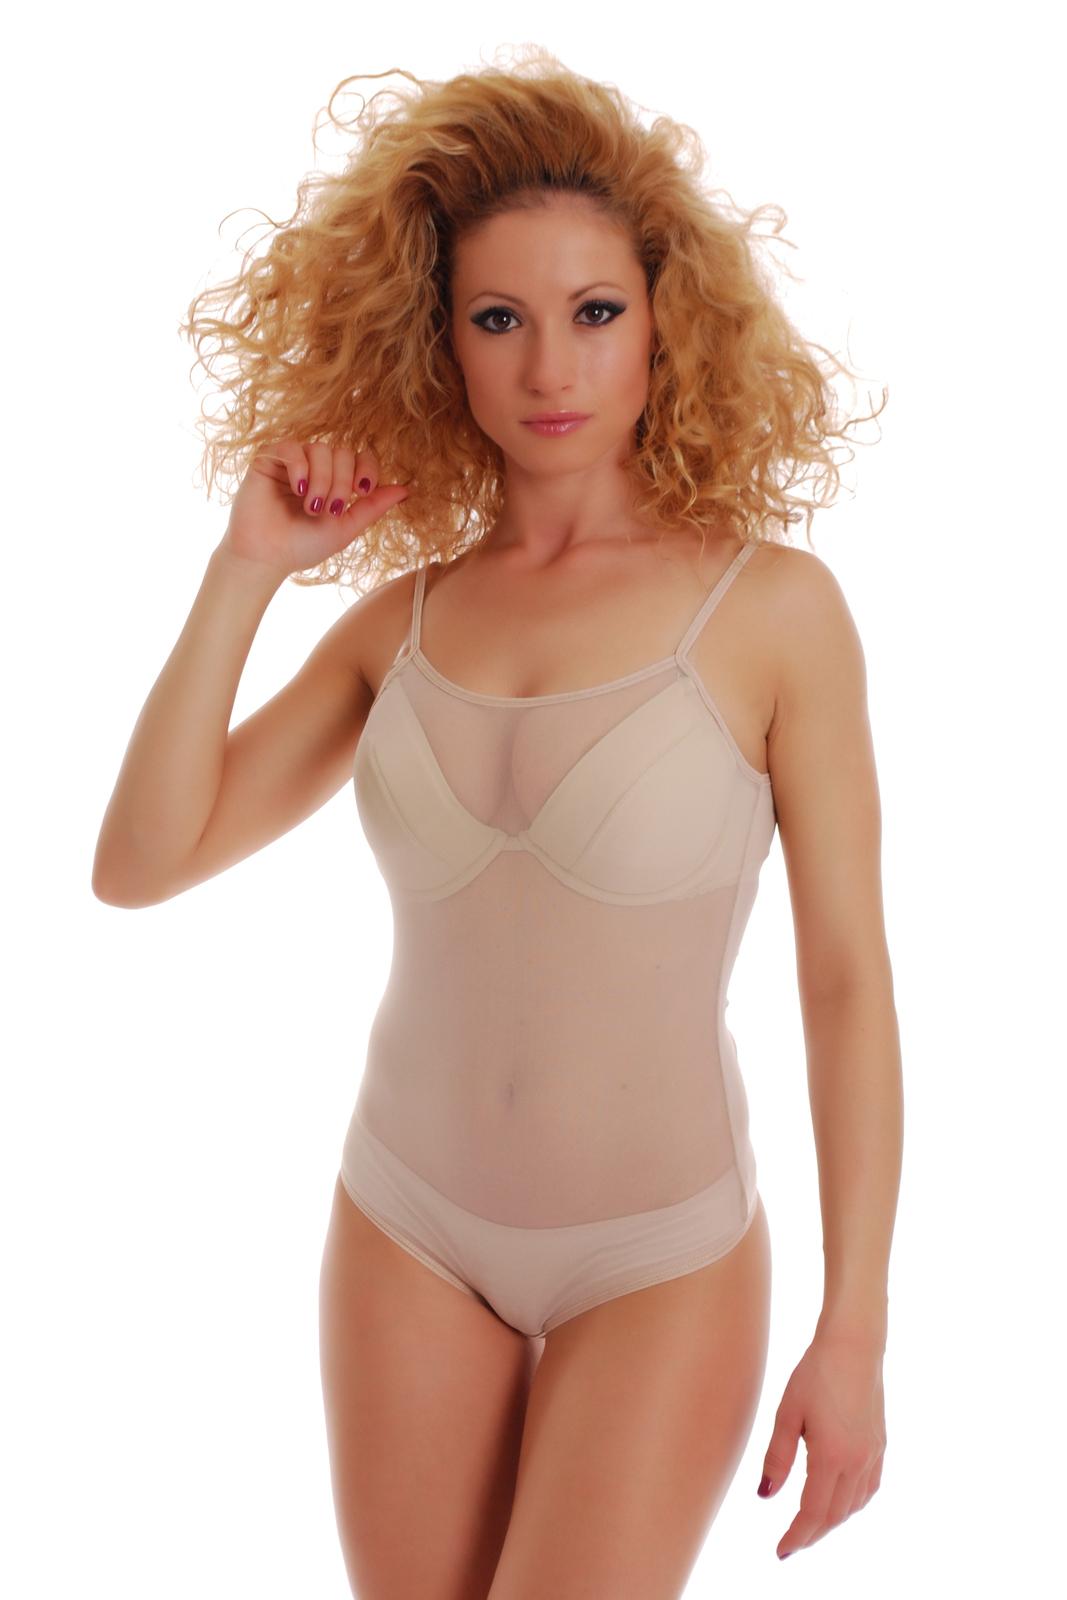 cd0c2a3589 Mesh Women Bodysuit Thin Strap See Through Vest Bikini 324 Leotard Body  Tulle EU